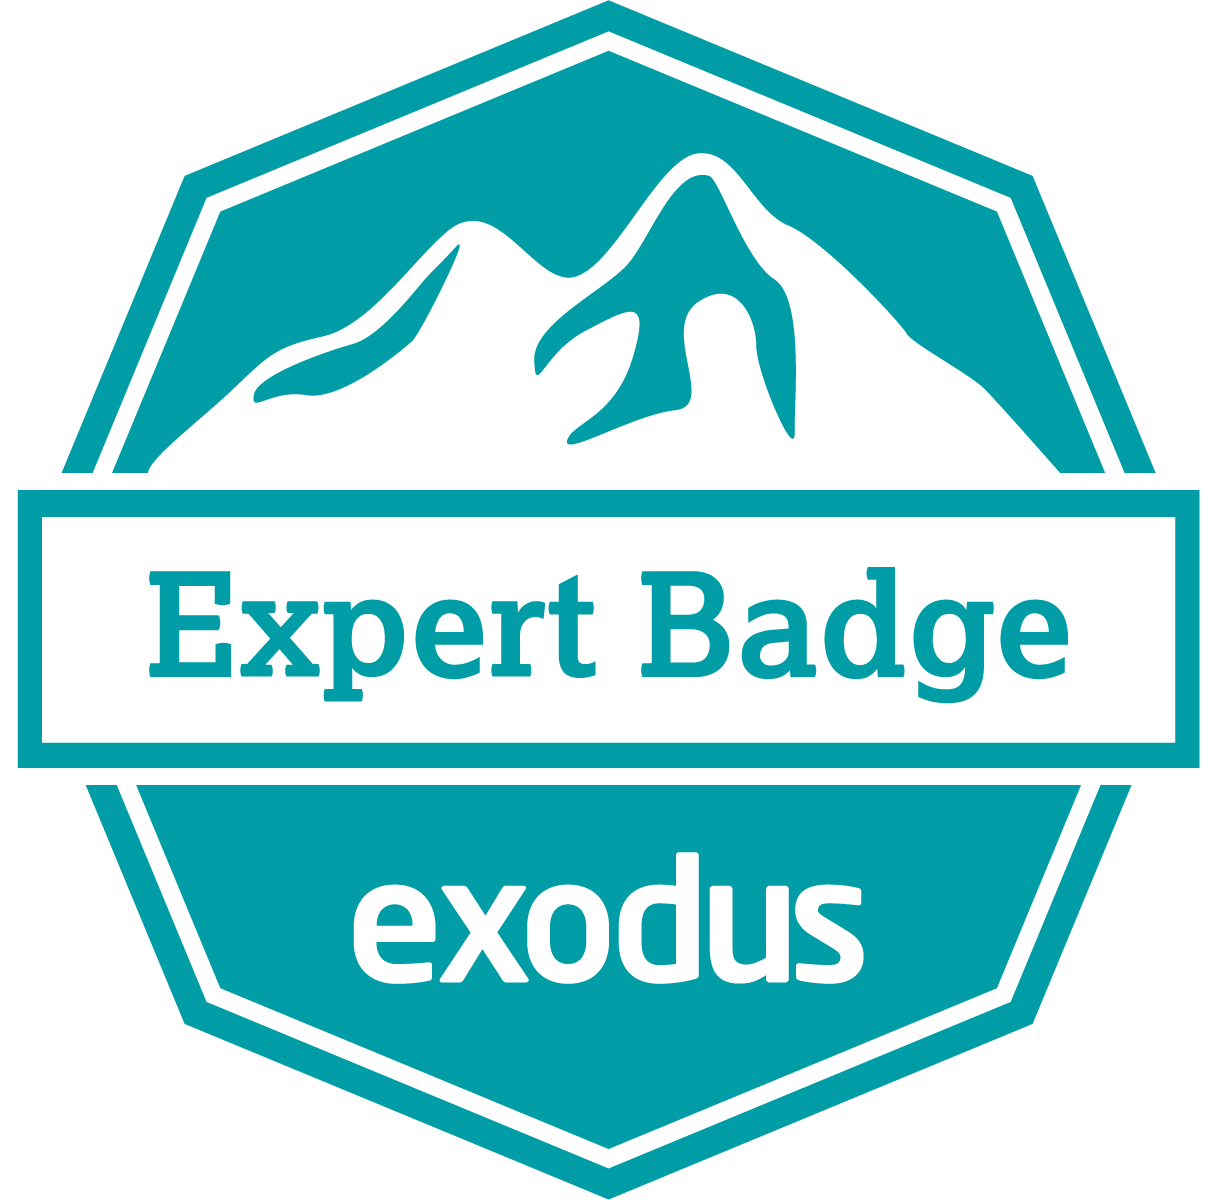 Exodus Expert Badge